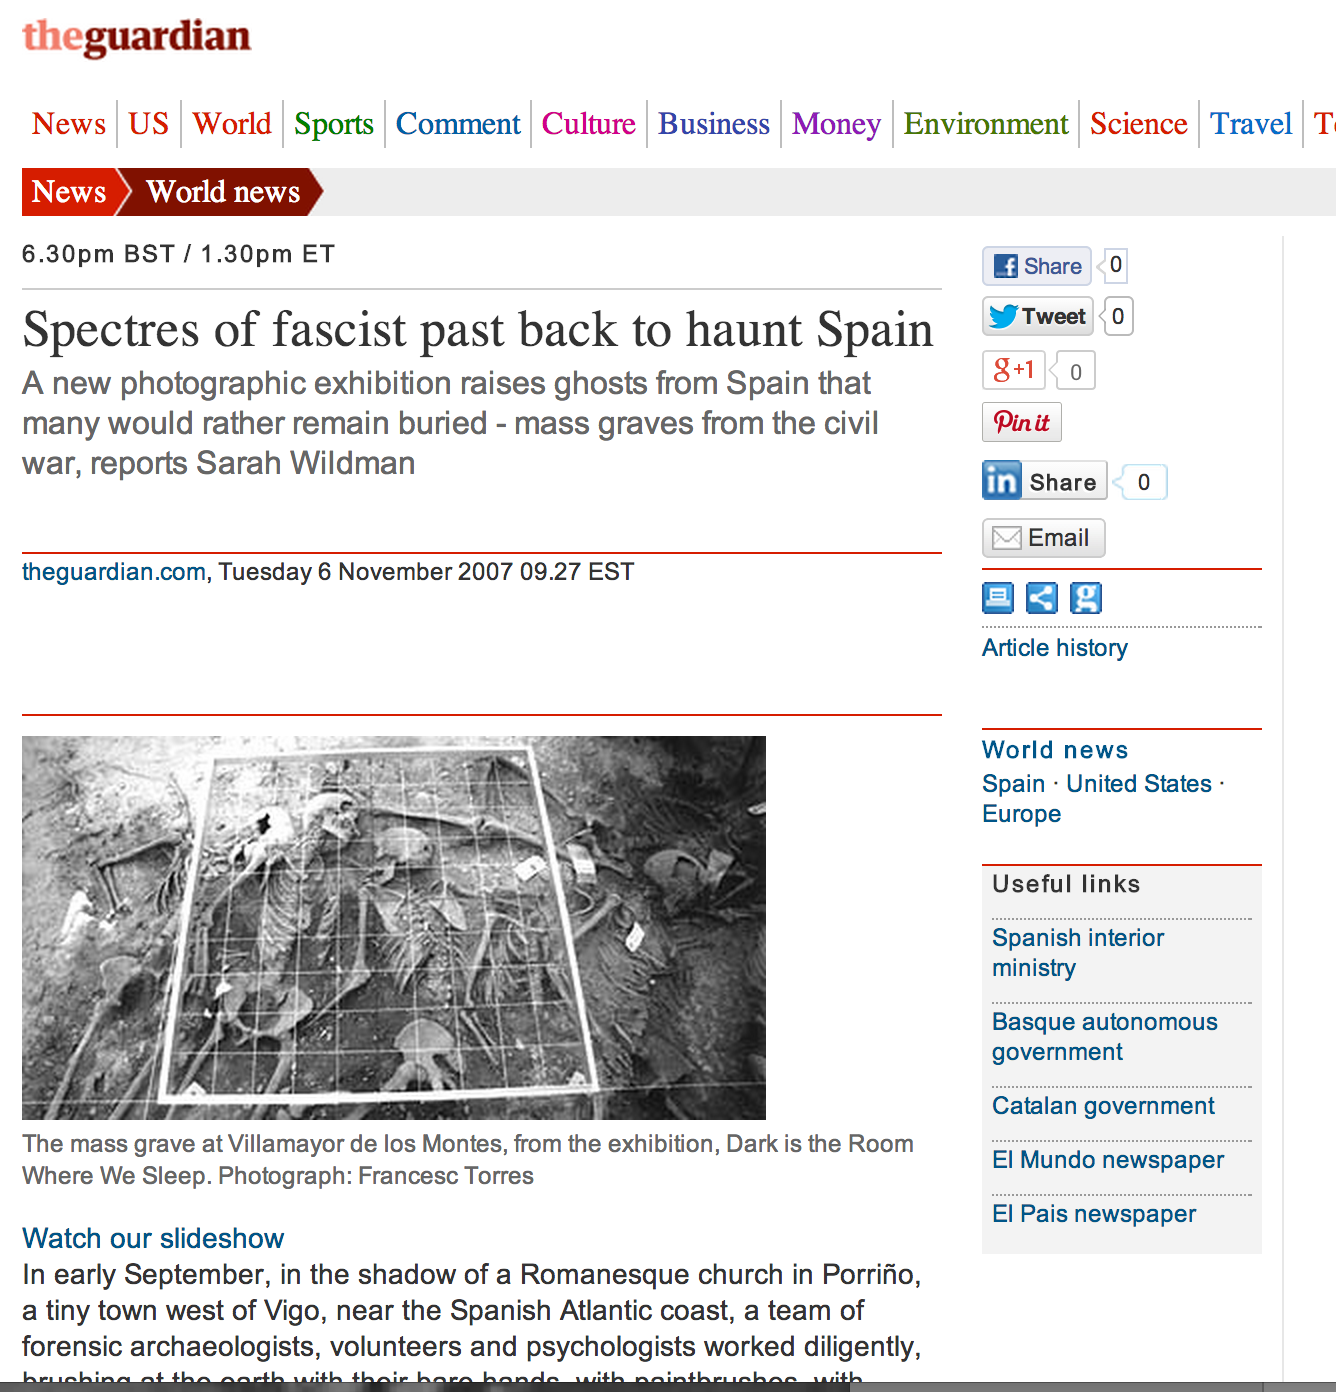 Spectres of Fascist Past